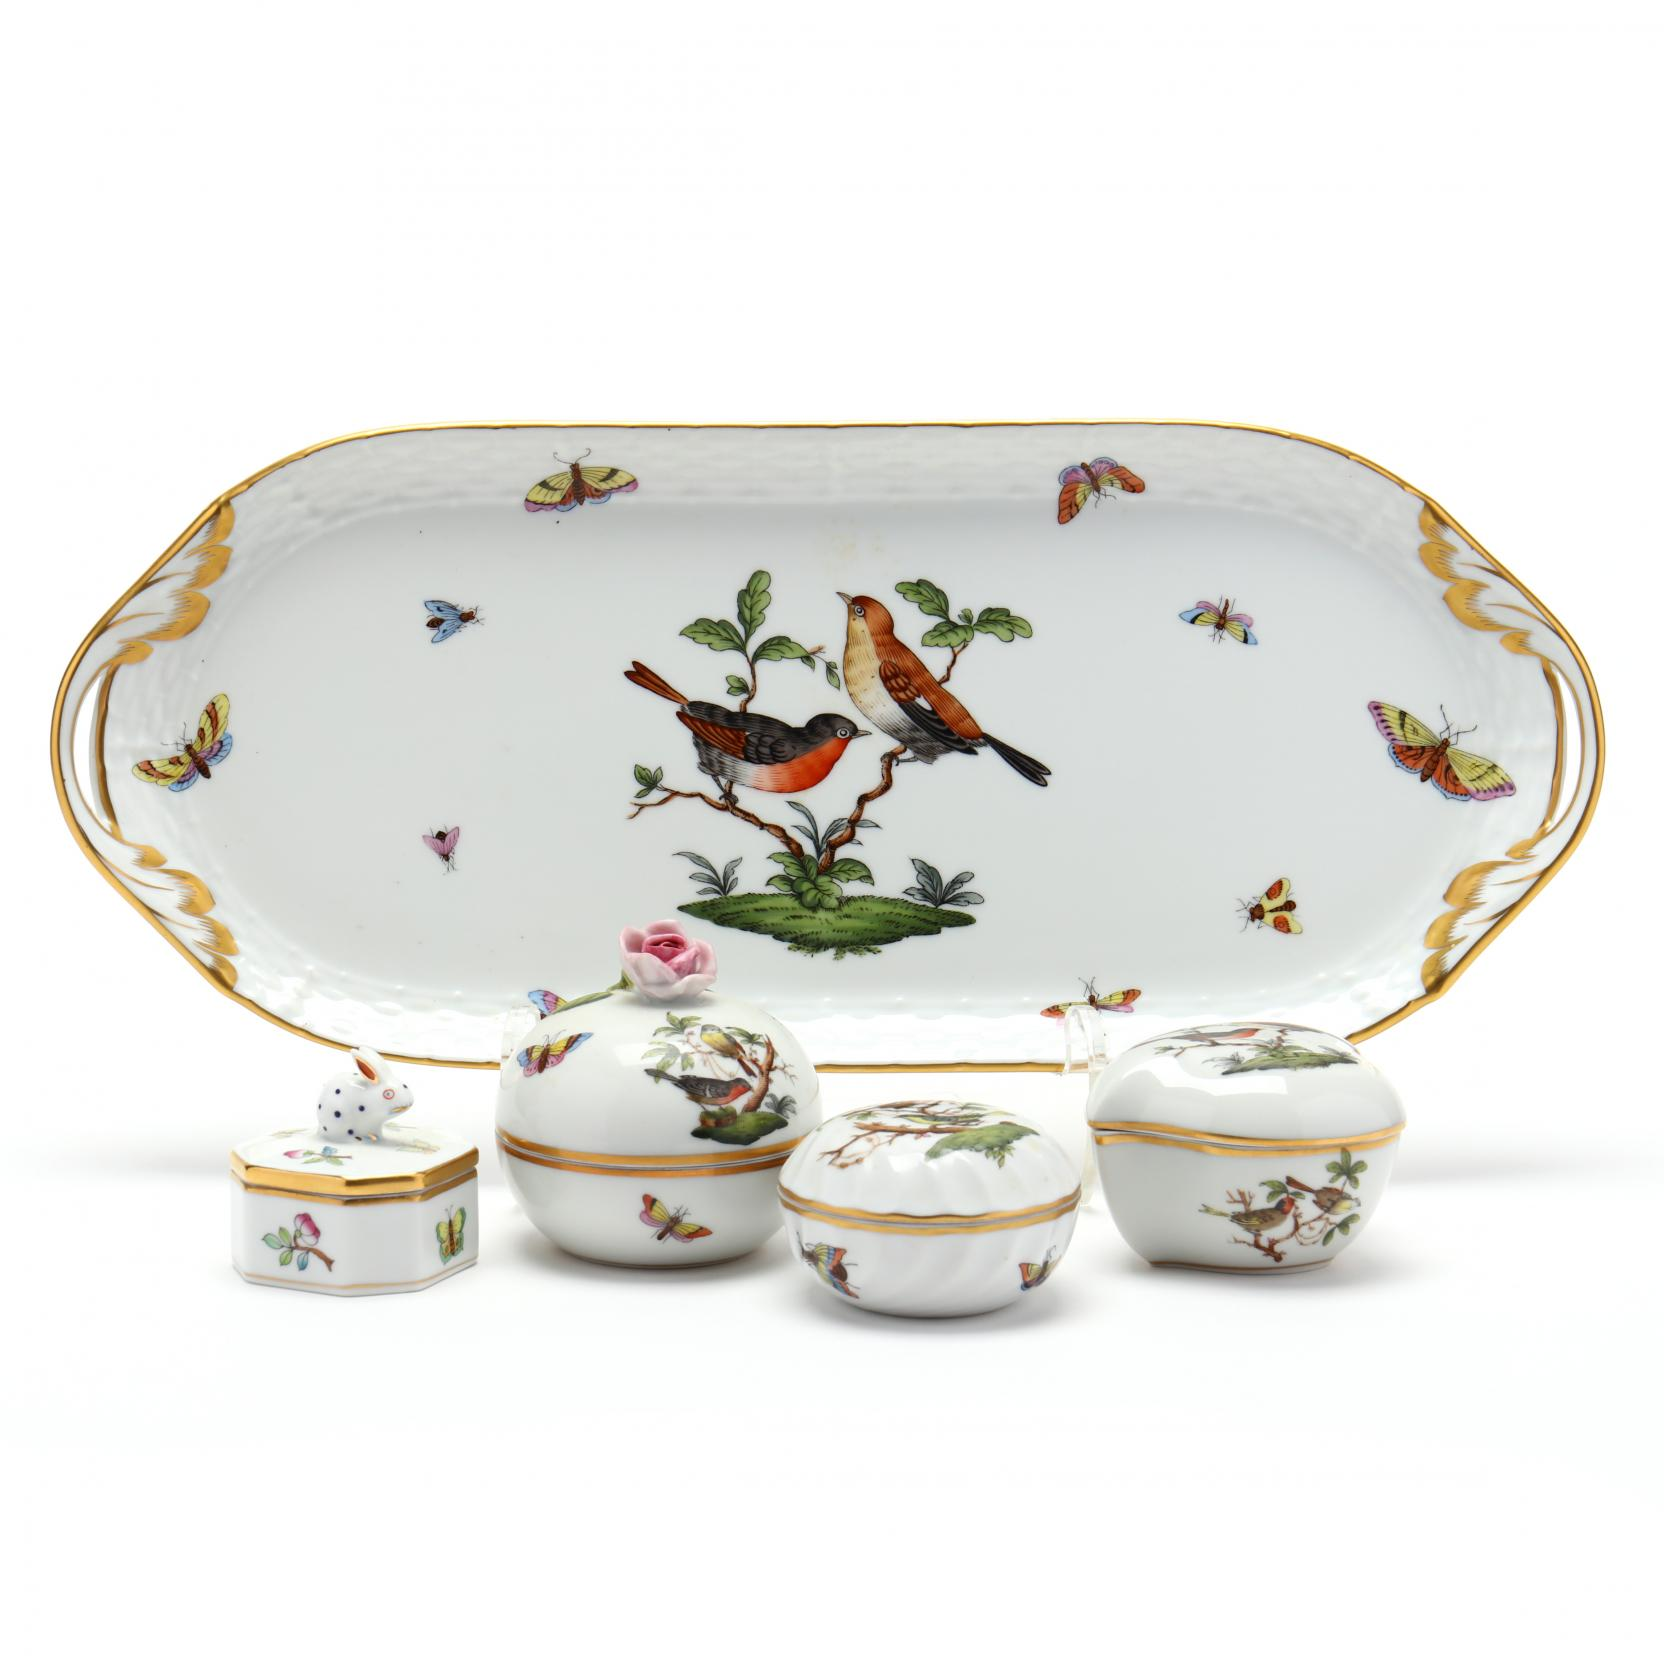 herend-rothschild-bird-dresser-tray-and-trinket-boxes